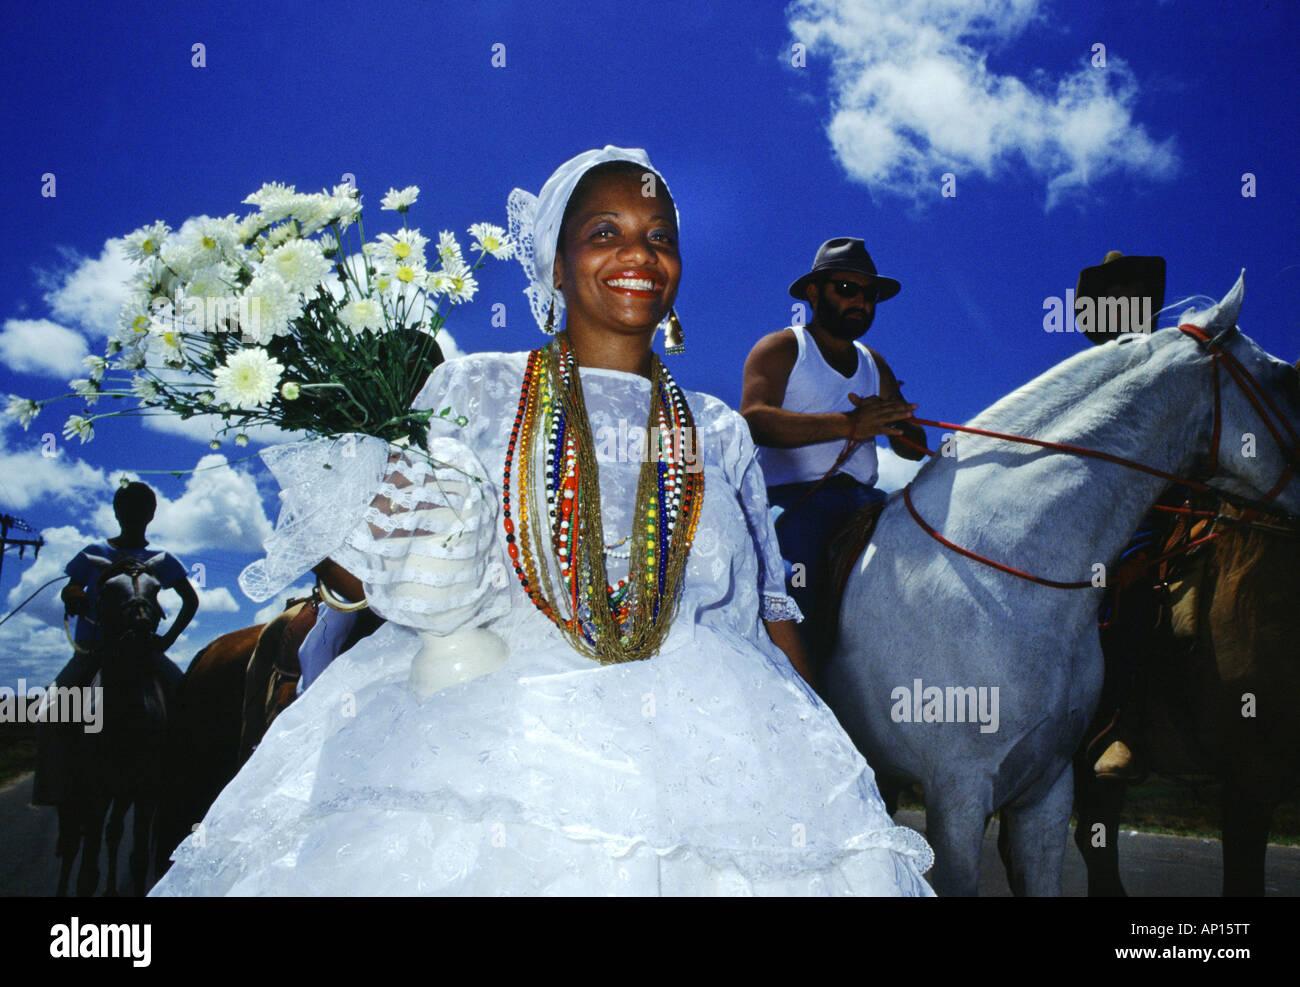 Candomble priestess at carnival, Salvador da Bahia, Brazil, South America - Stock Image